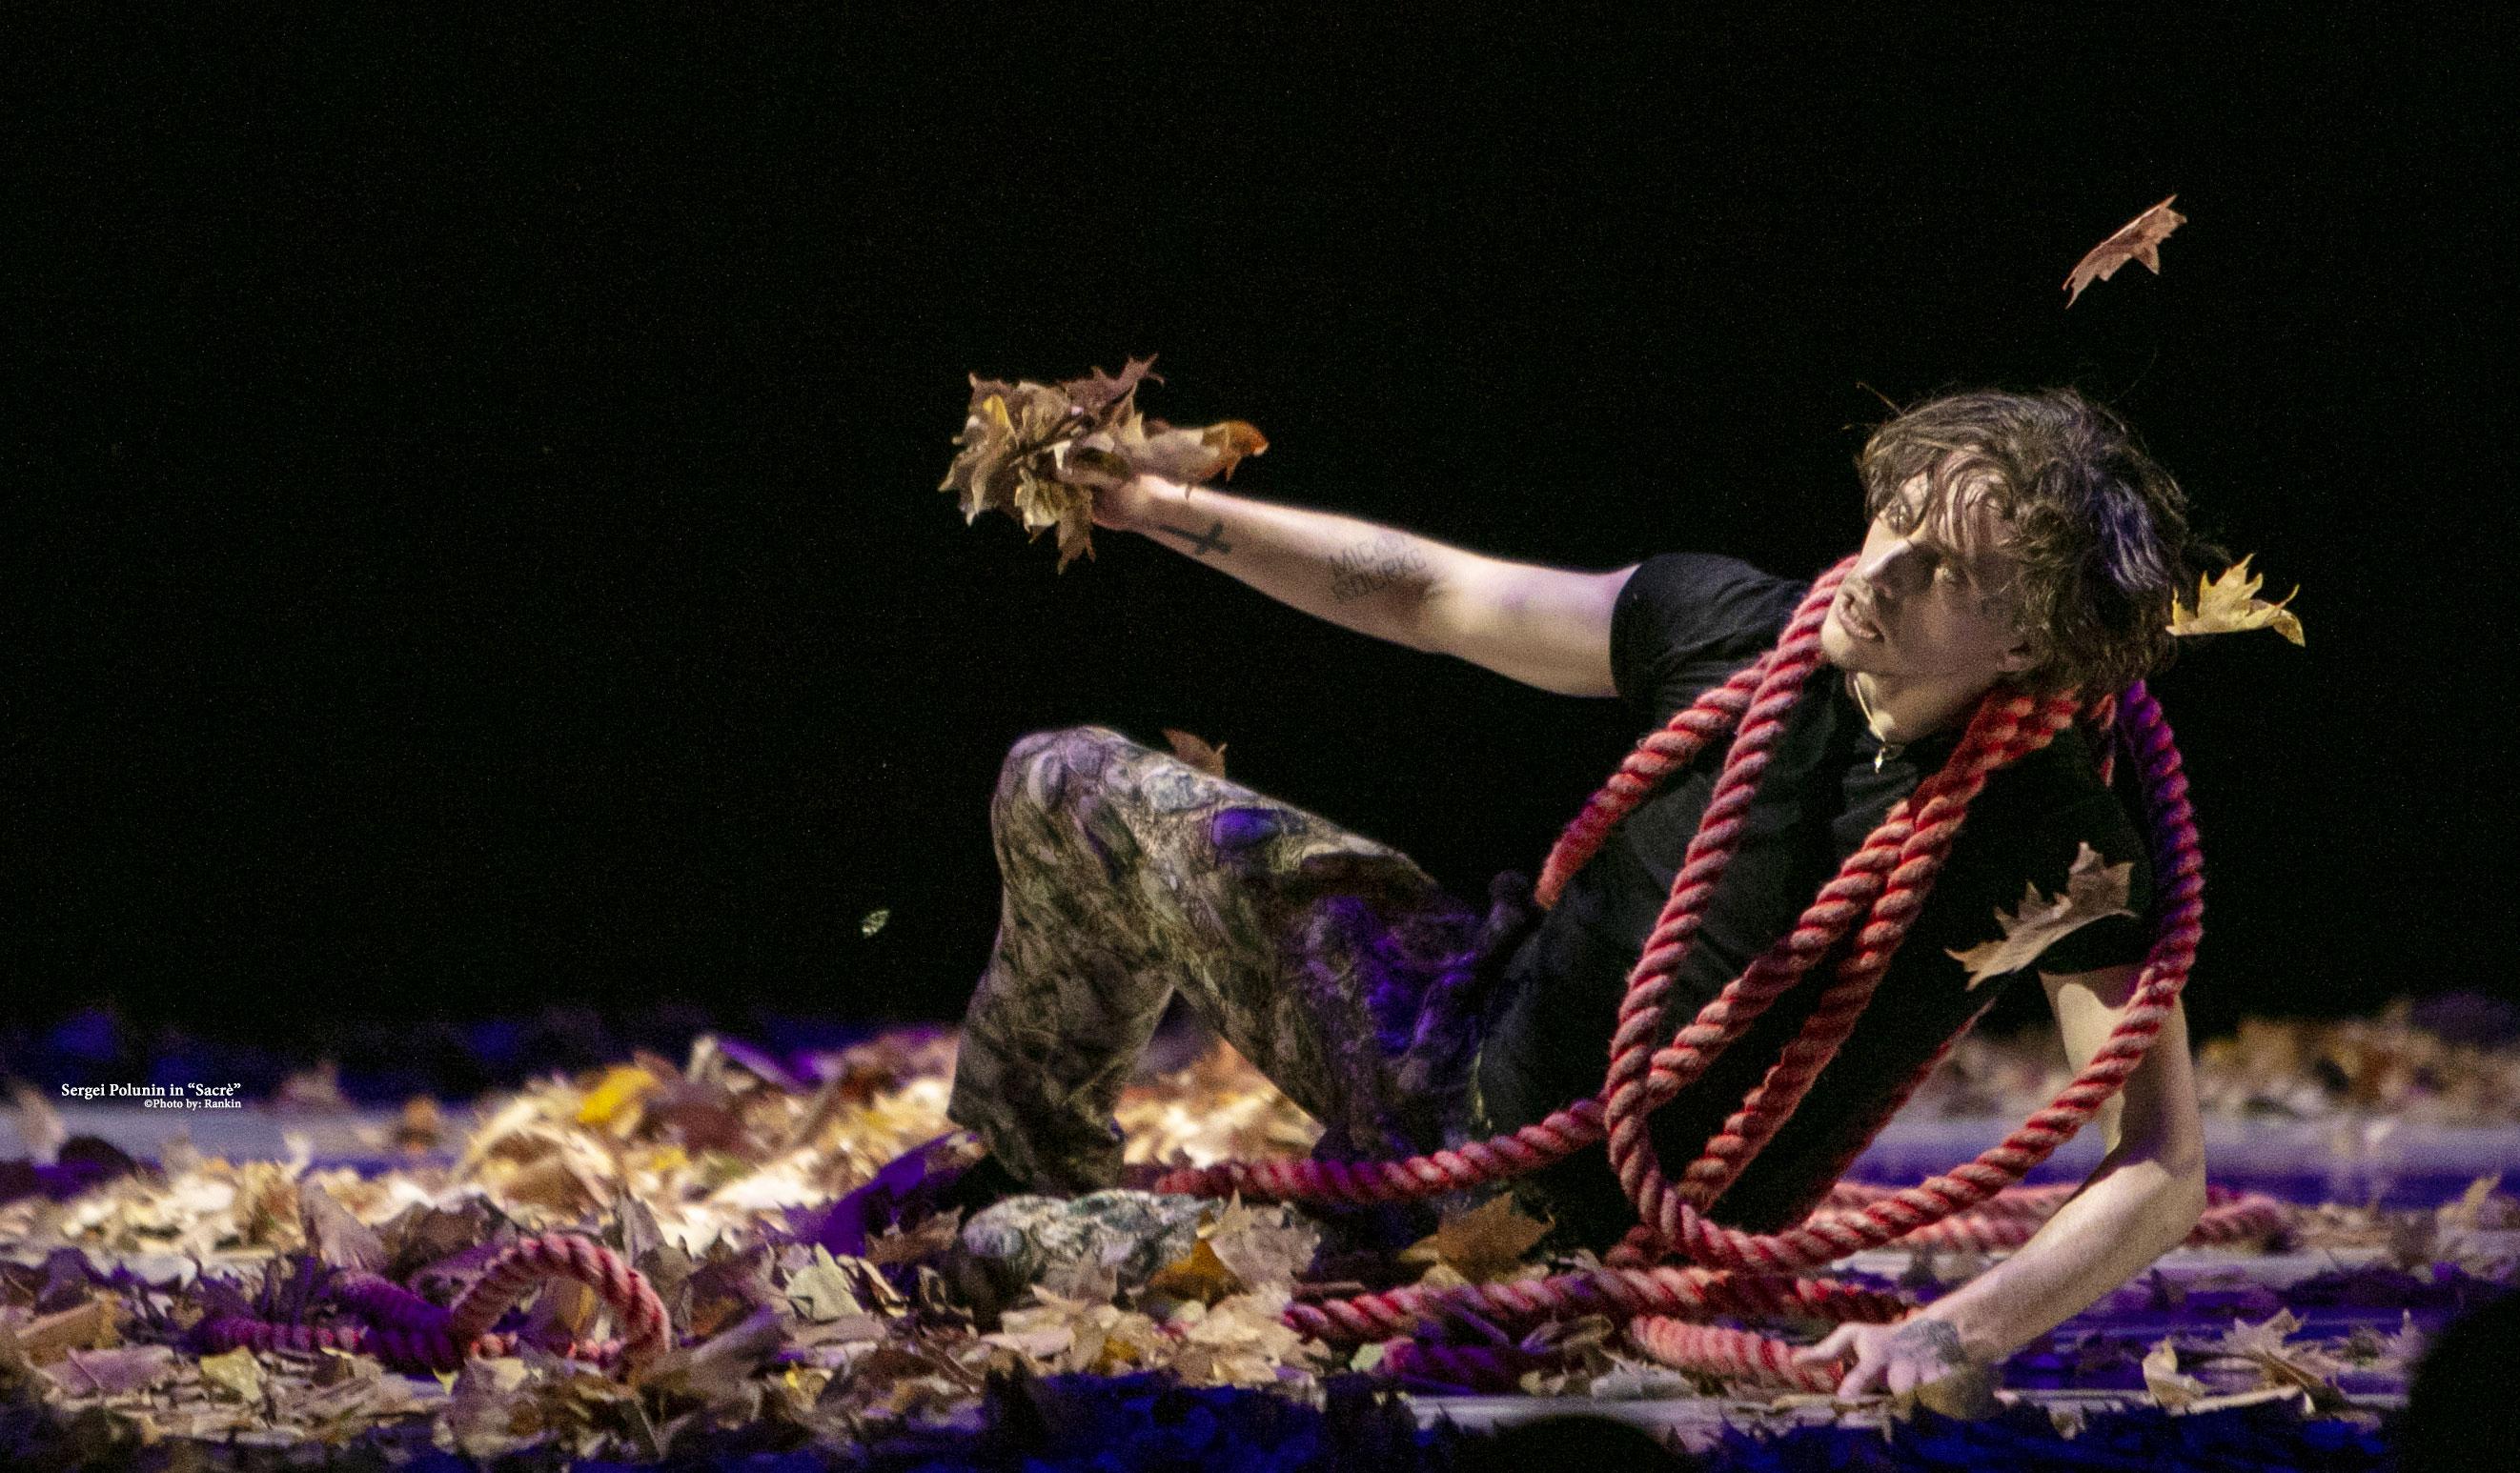 Sergei-Polunin-In-Sacrè---Florence-Dance-Festival-2019---PageTitleBar